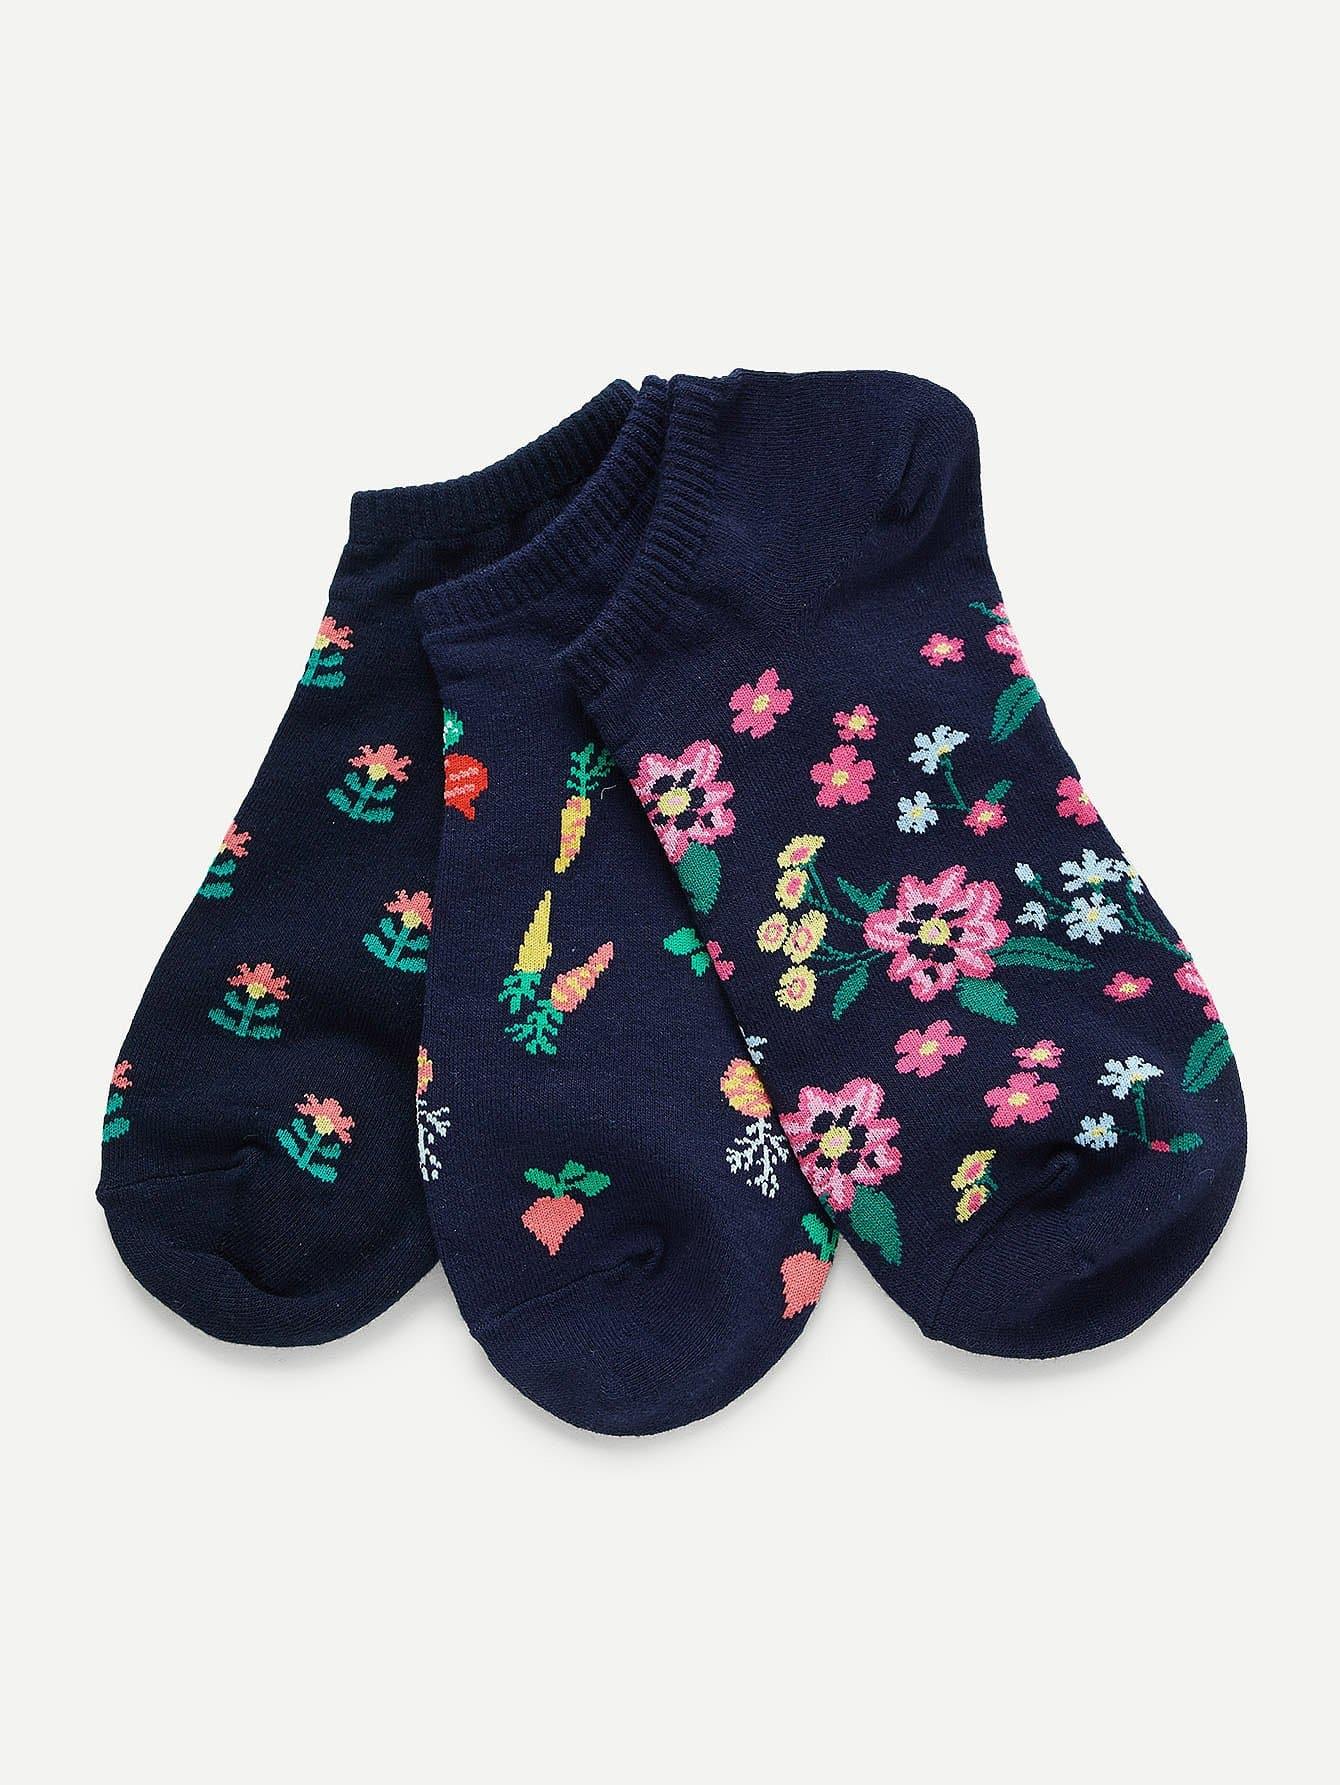 Calico Print Invisible Socks 3pairs animal embroidery invisible socks 3pairs